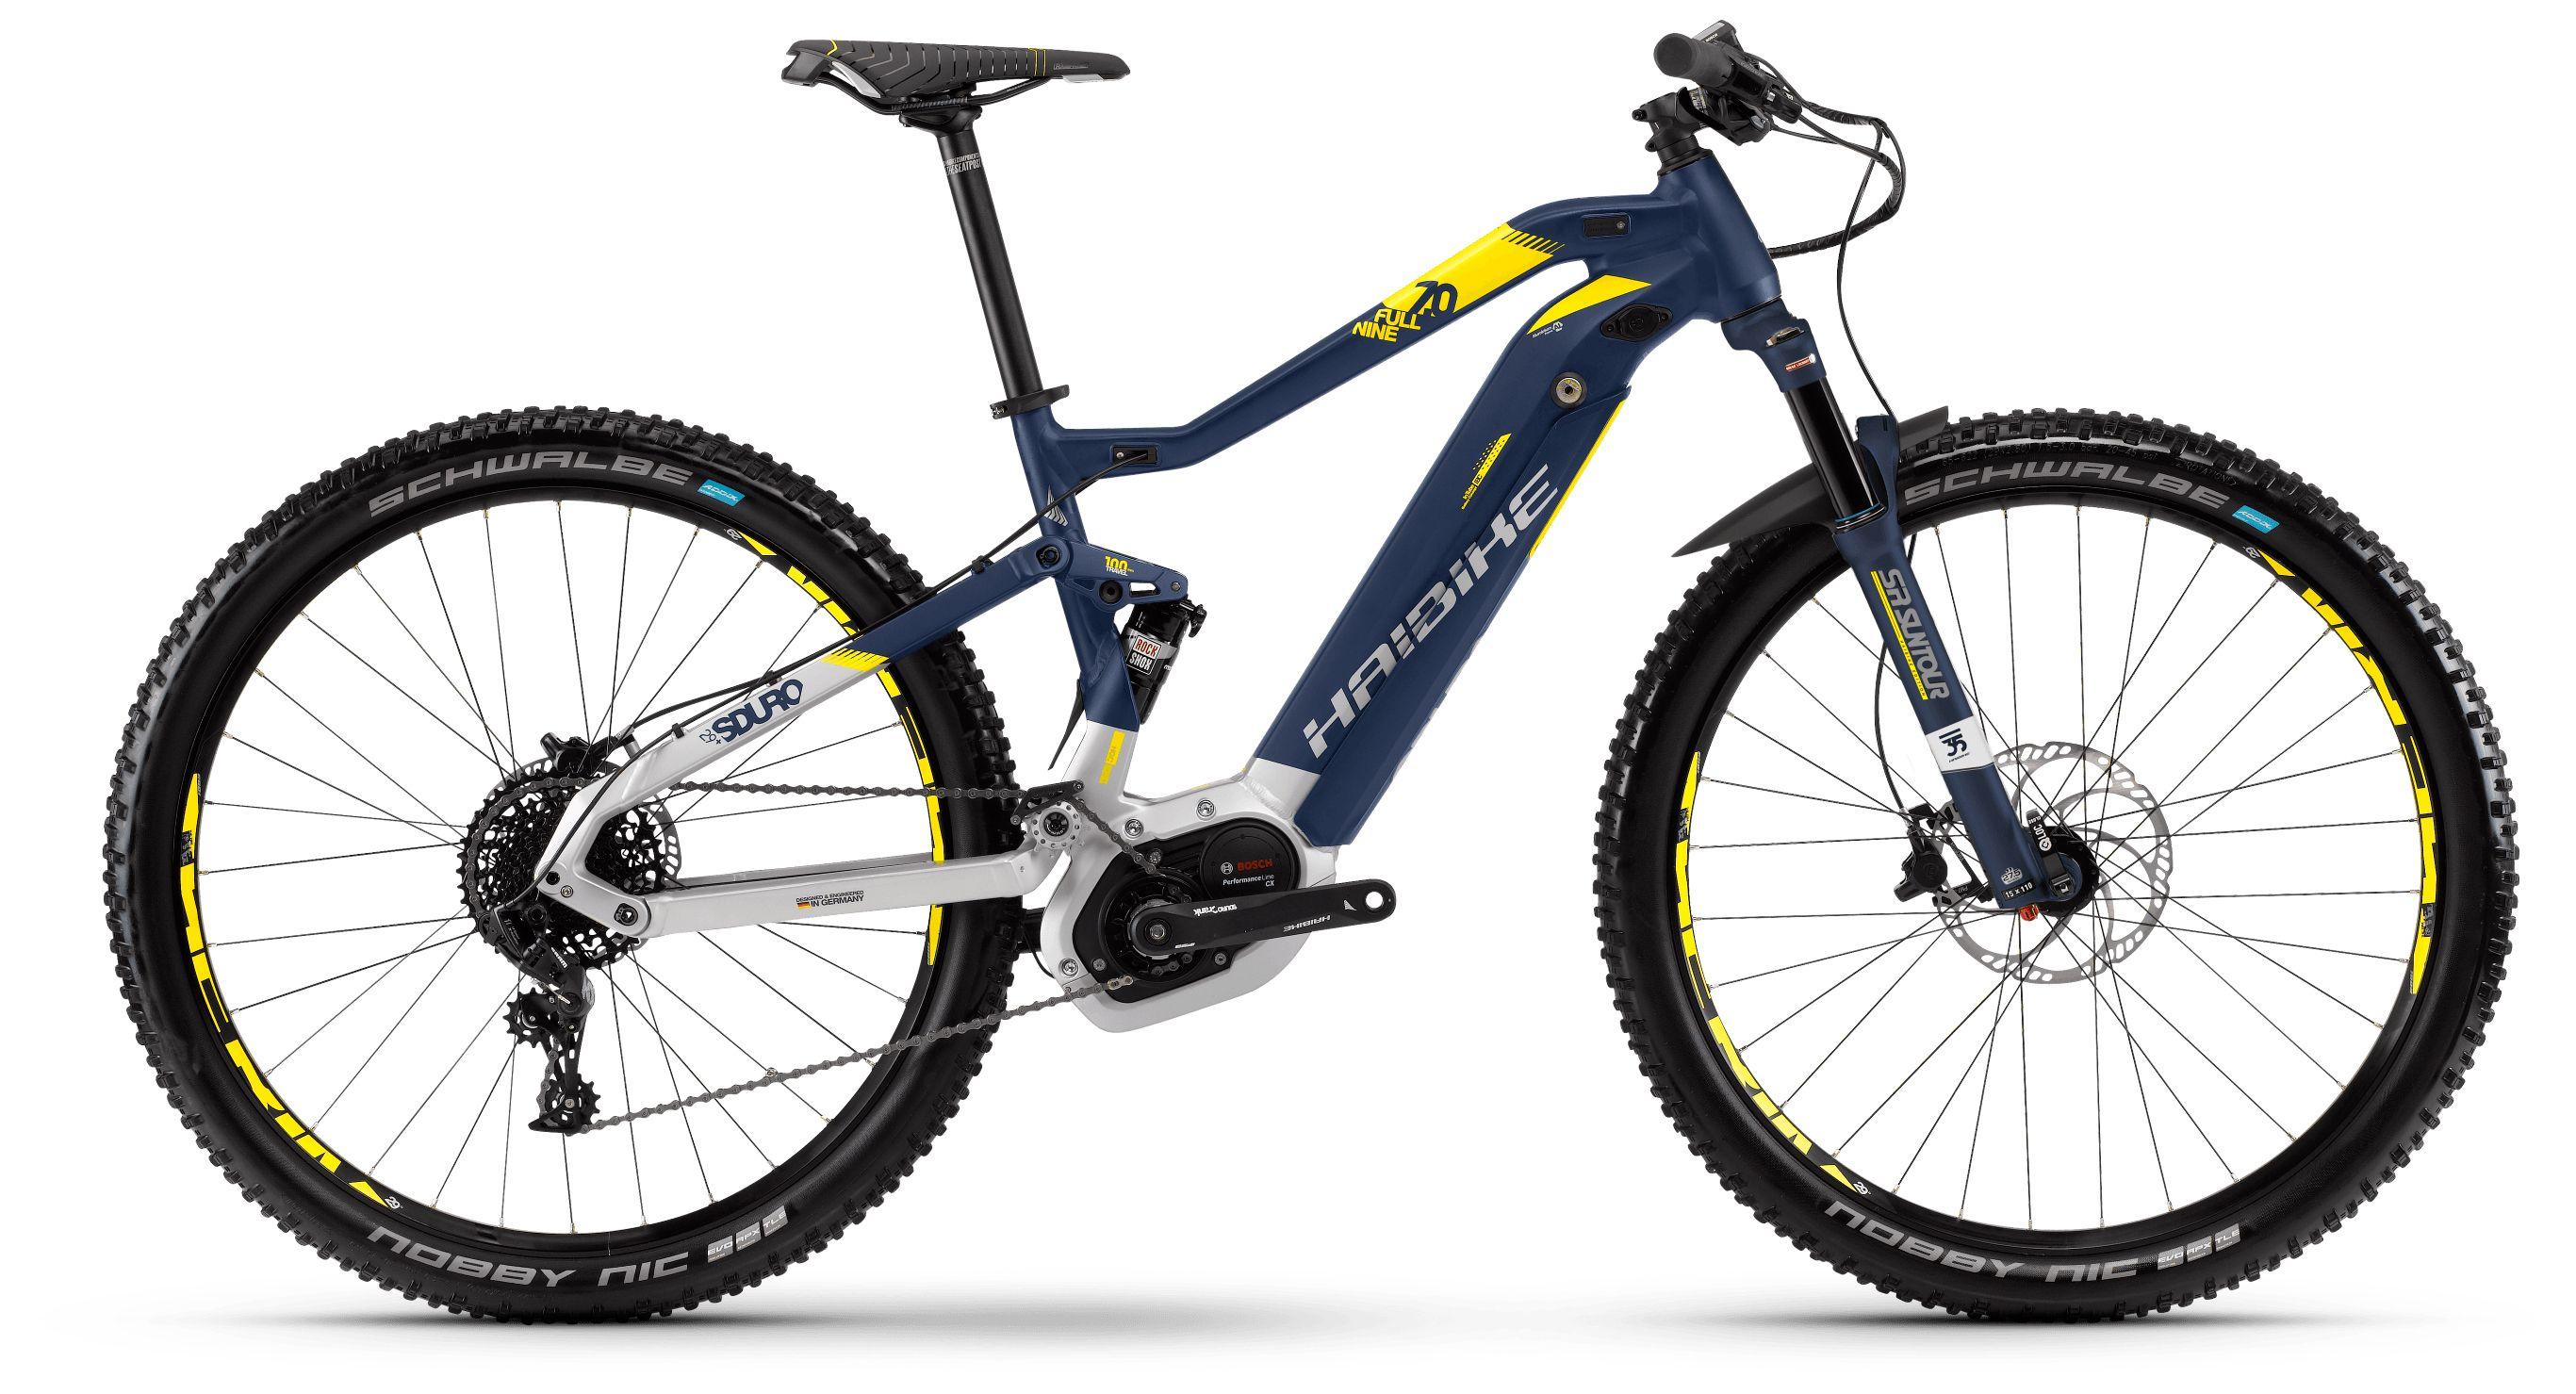 Велосипед Haibike Sduro FullNine 7.0 500Wh 11s NX 2018 велосипед haibike sduro hardseven 2 0 400wh 11s nx 2018